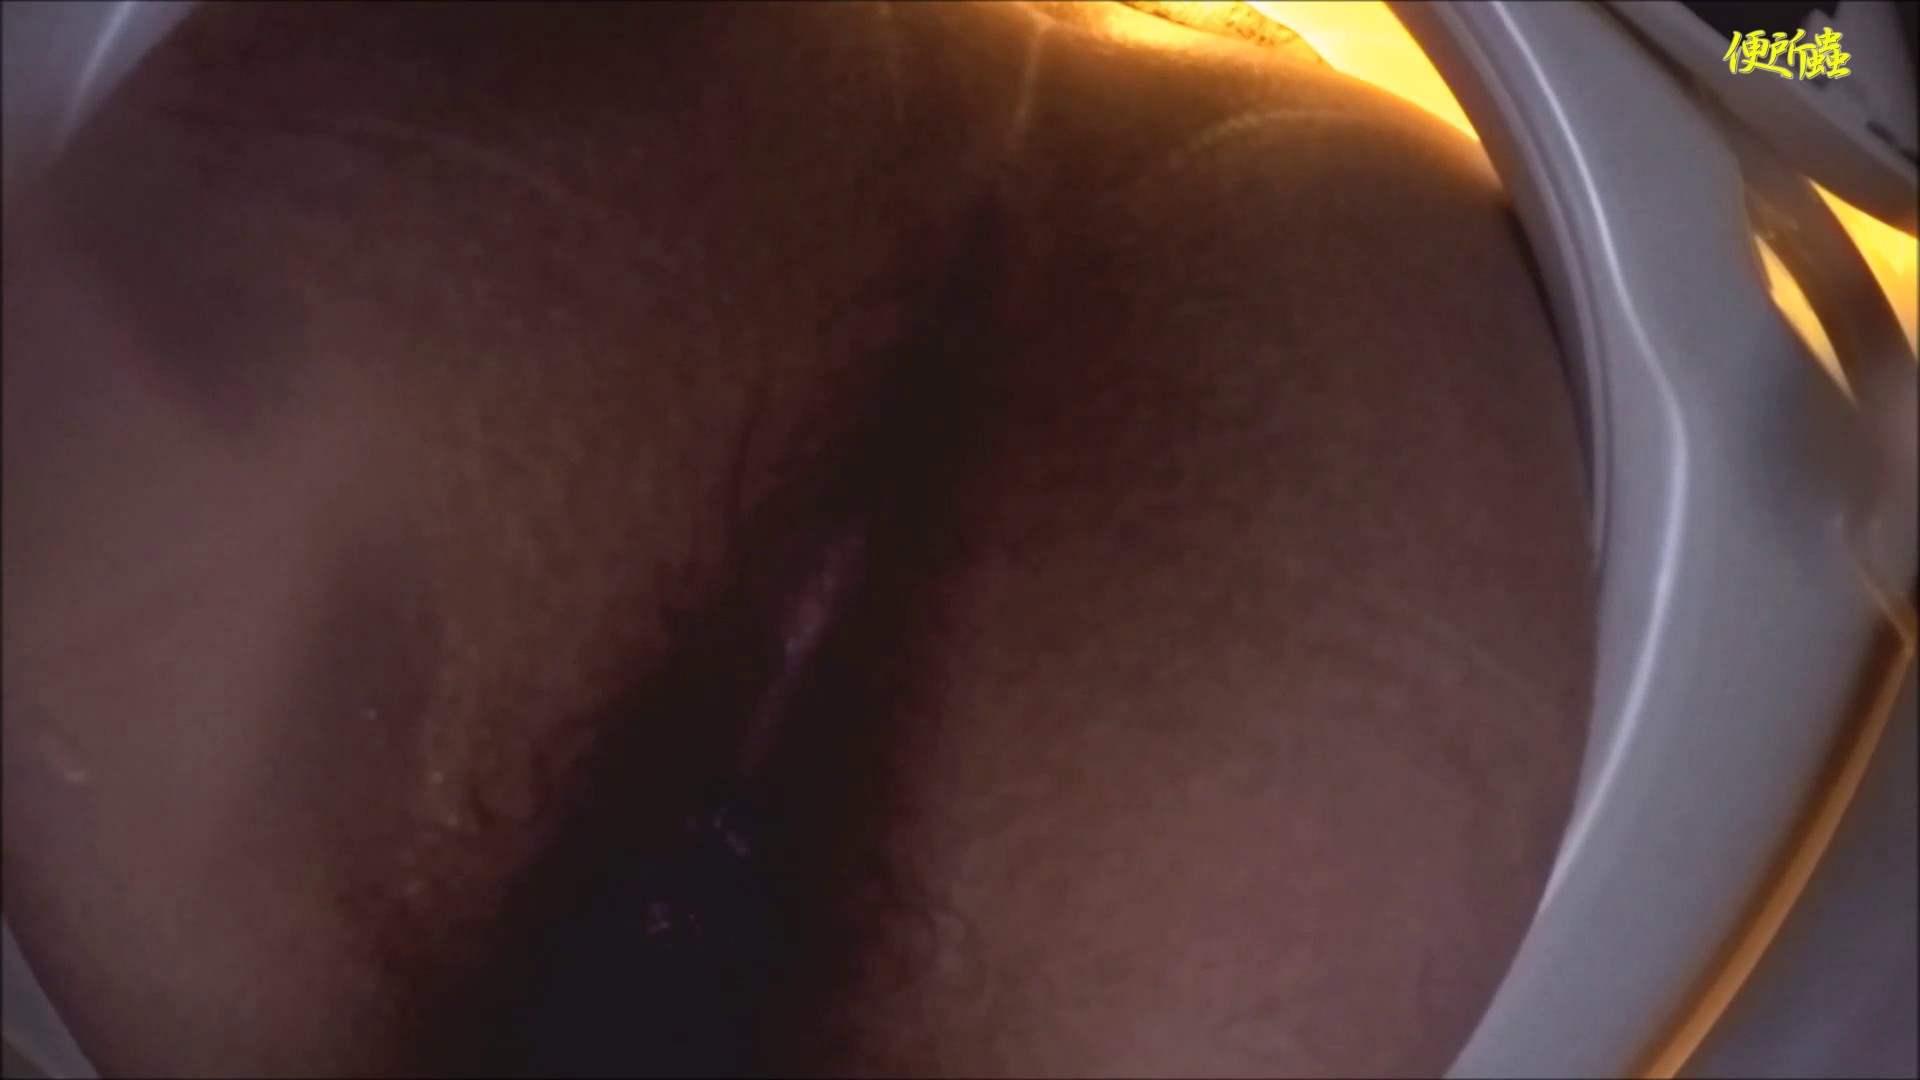 vol.07 便所蟲さんのリターン~寺子屋洗面所盗撮~※画質改善※総勢7名 洗面所   便所  31pic 11